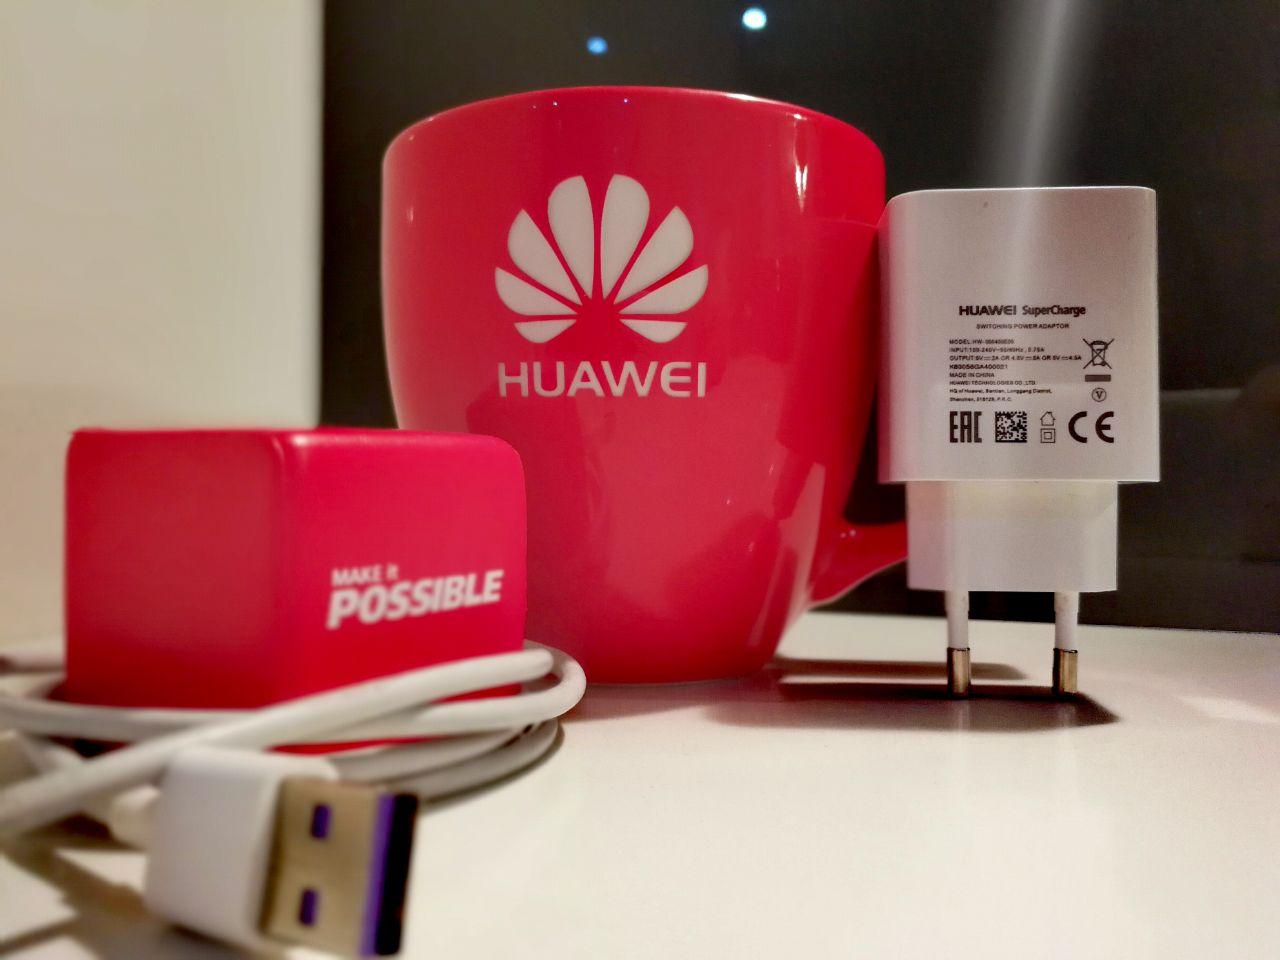 Huawei SuperCharge Ladegerät